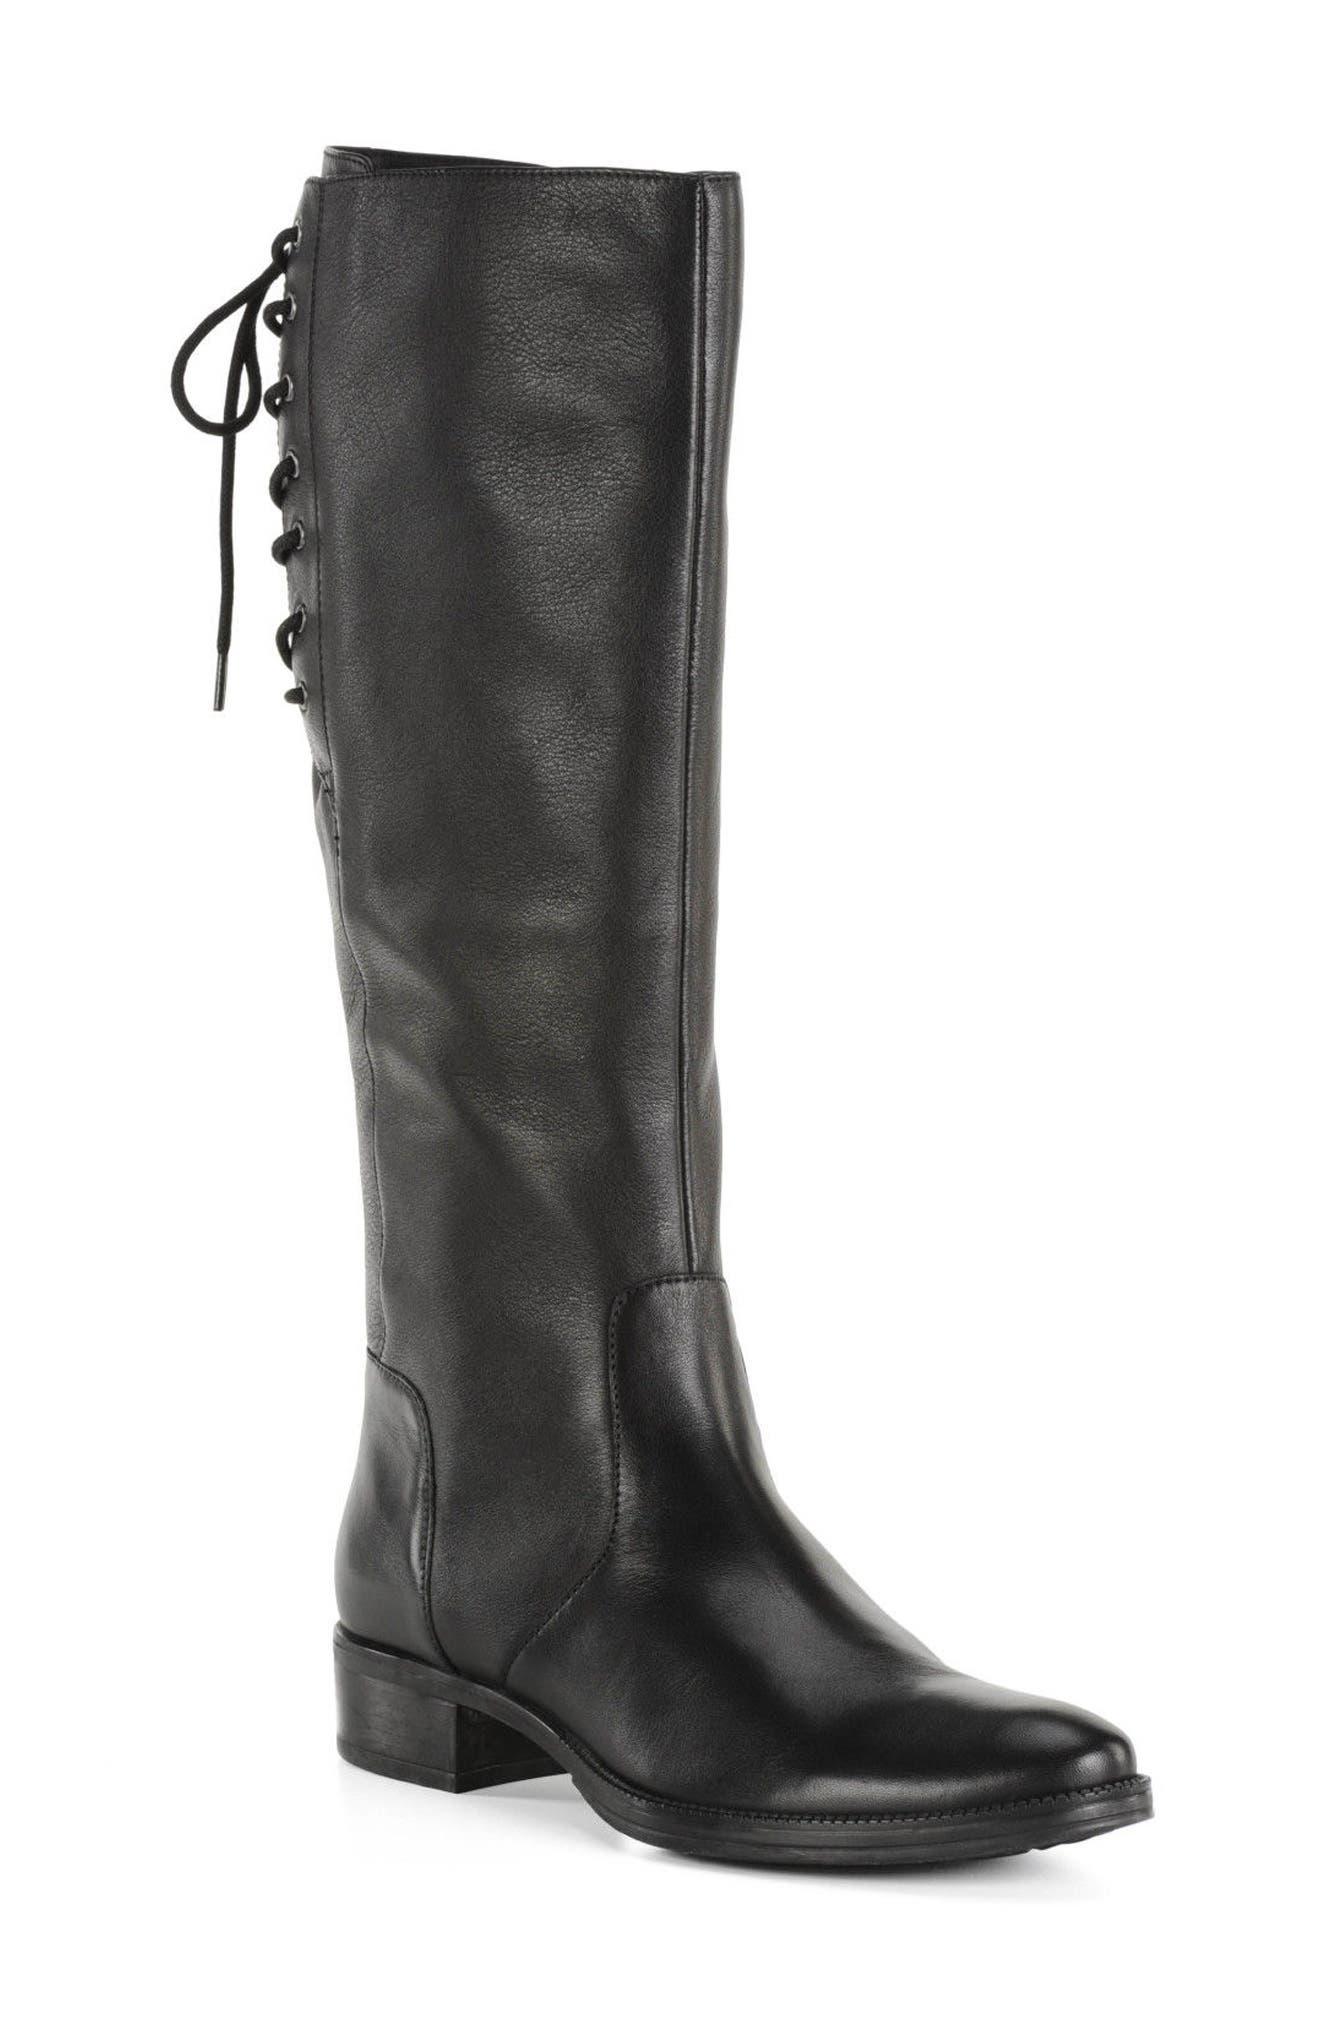 Mendi Tall Boot,                         Main,                         color, 001